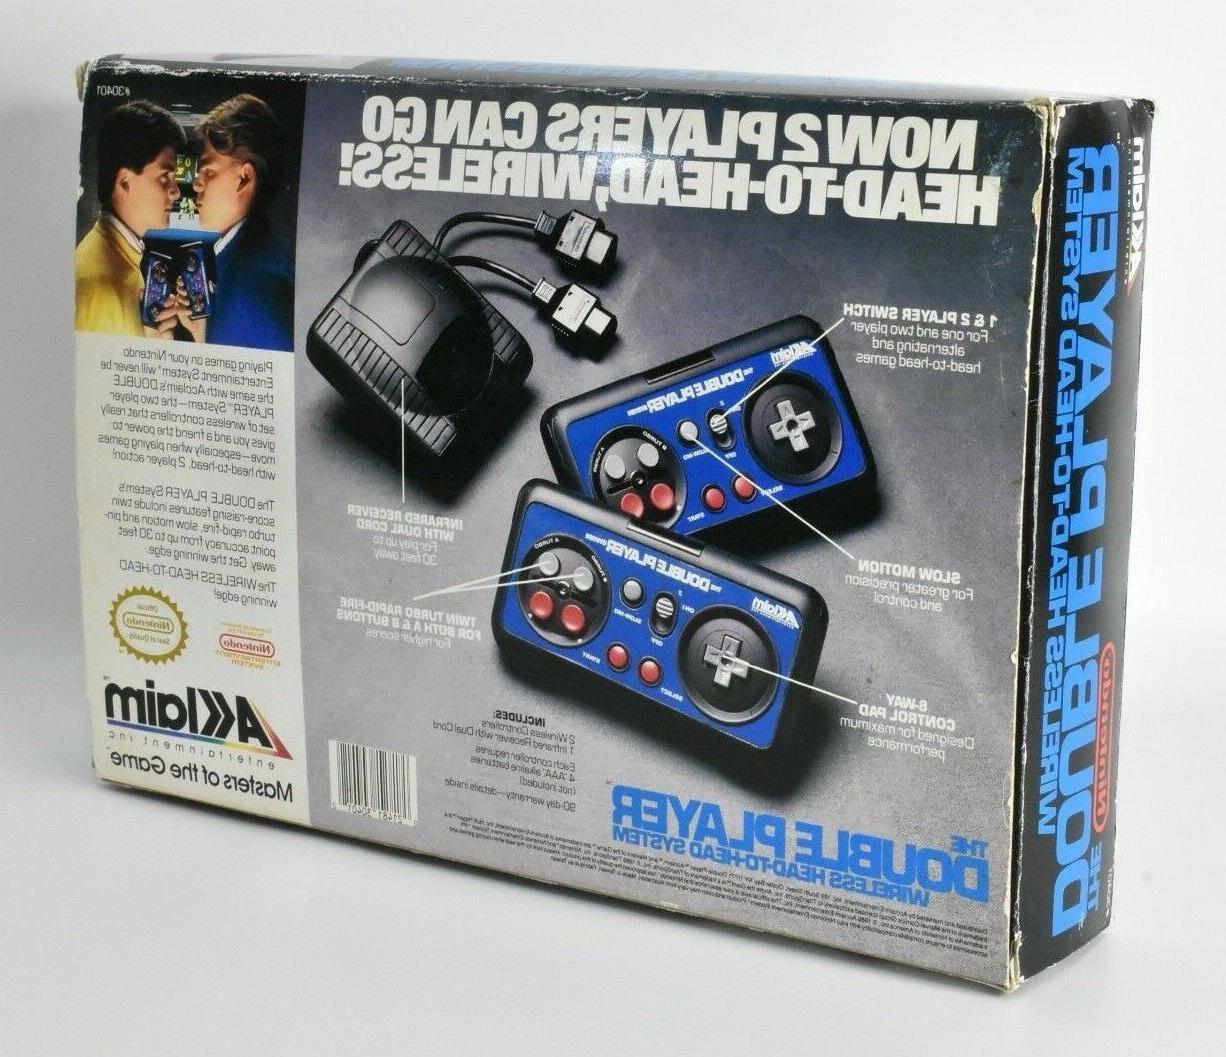 The Nintendo Player head Box